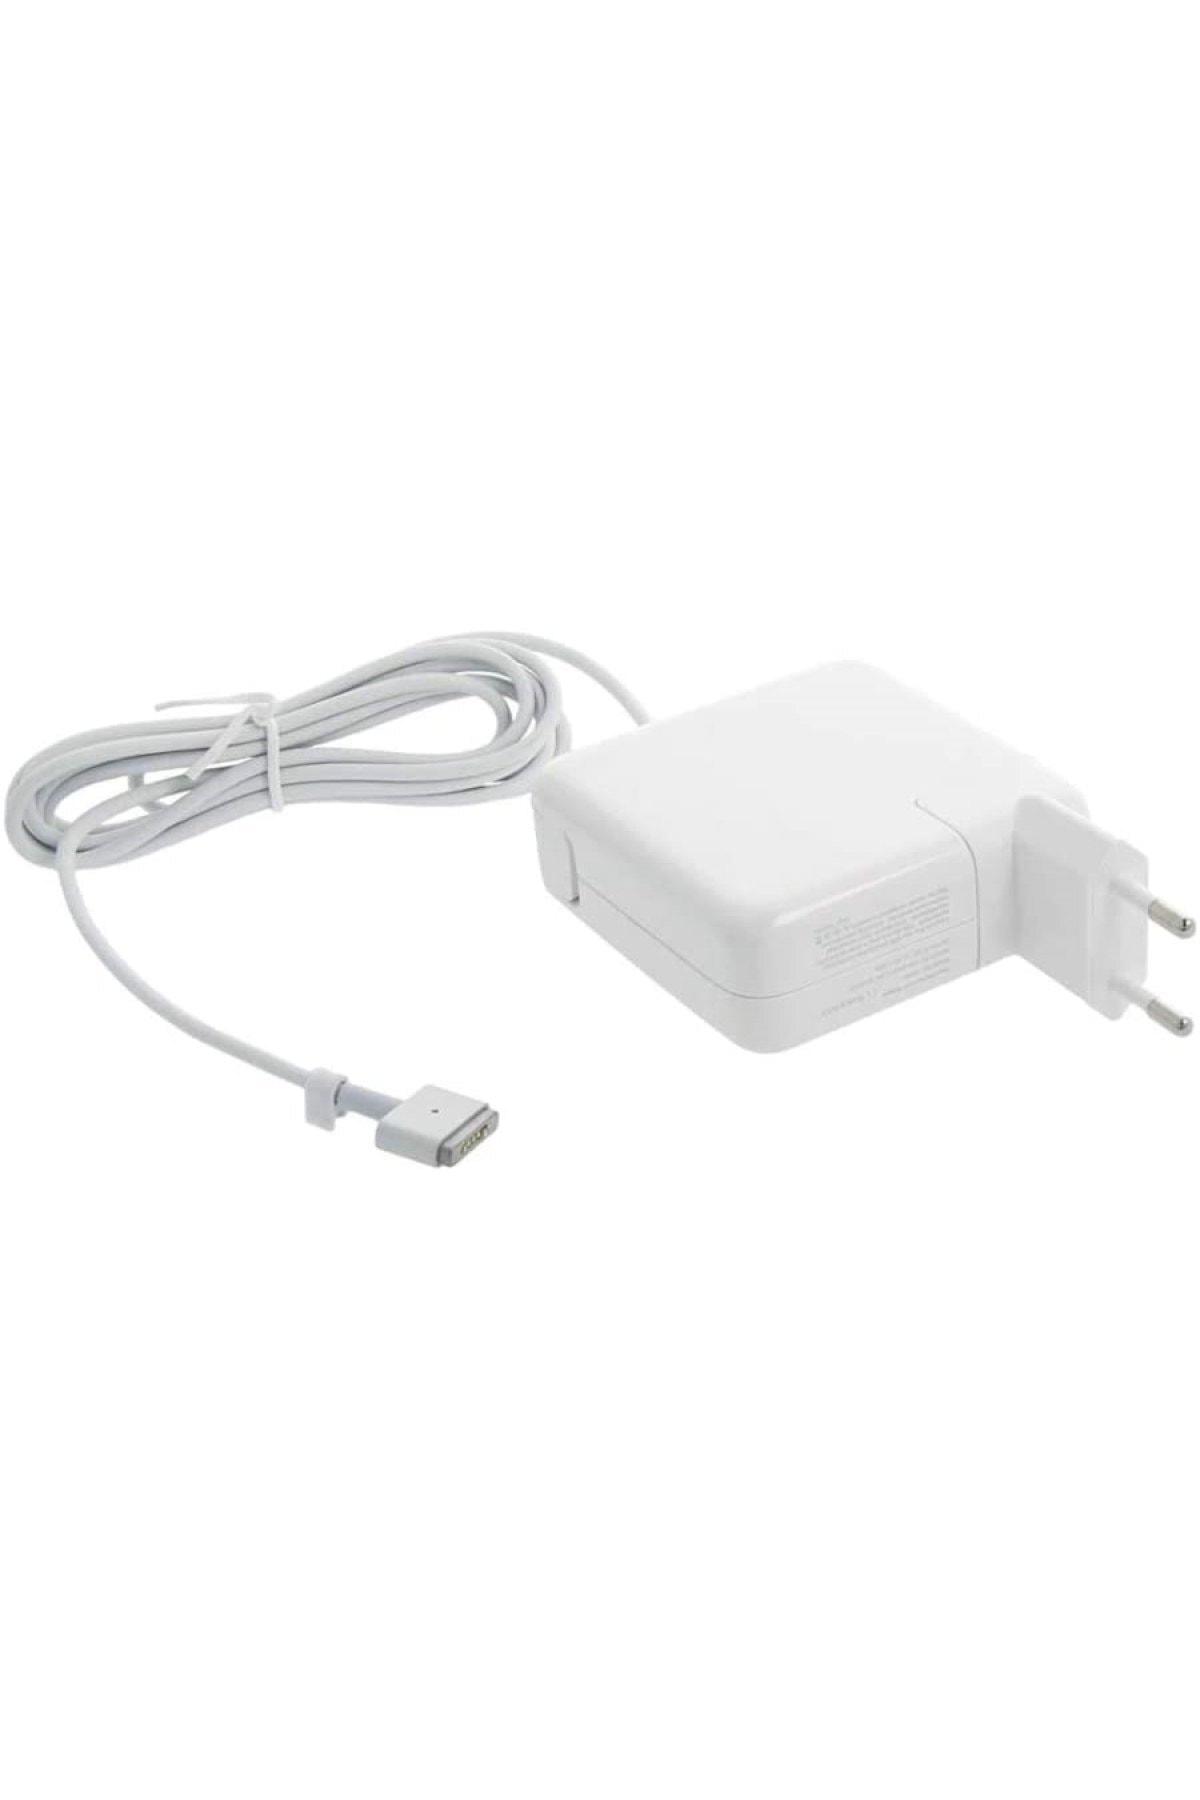 İnfomax Macbook Air A1465 Adaptör Şarj Aleti 2